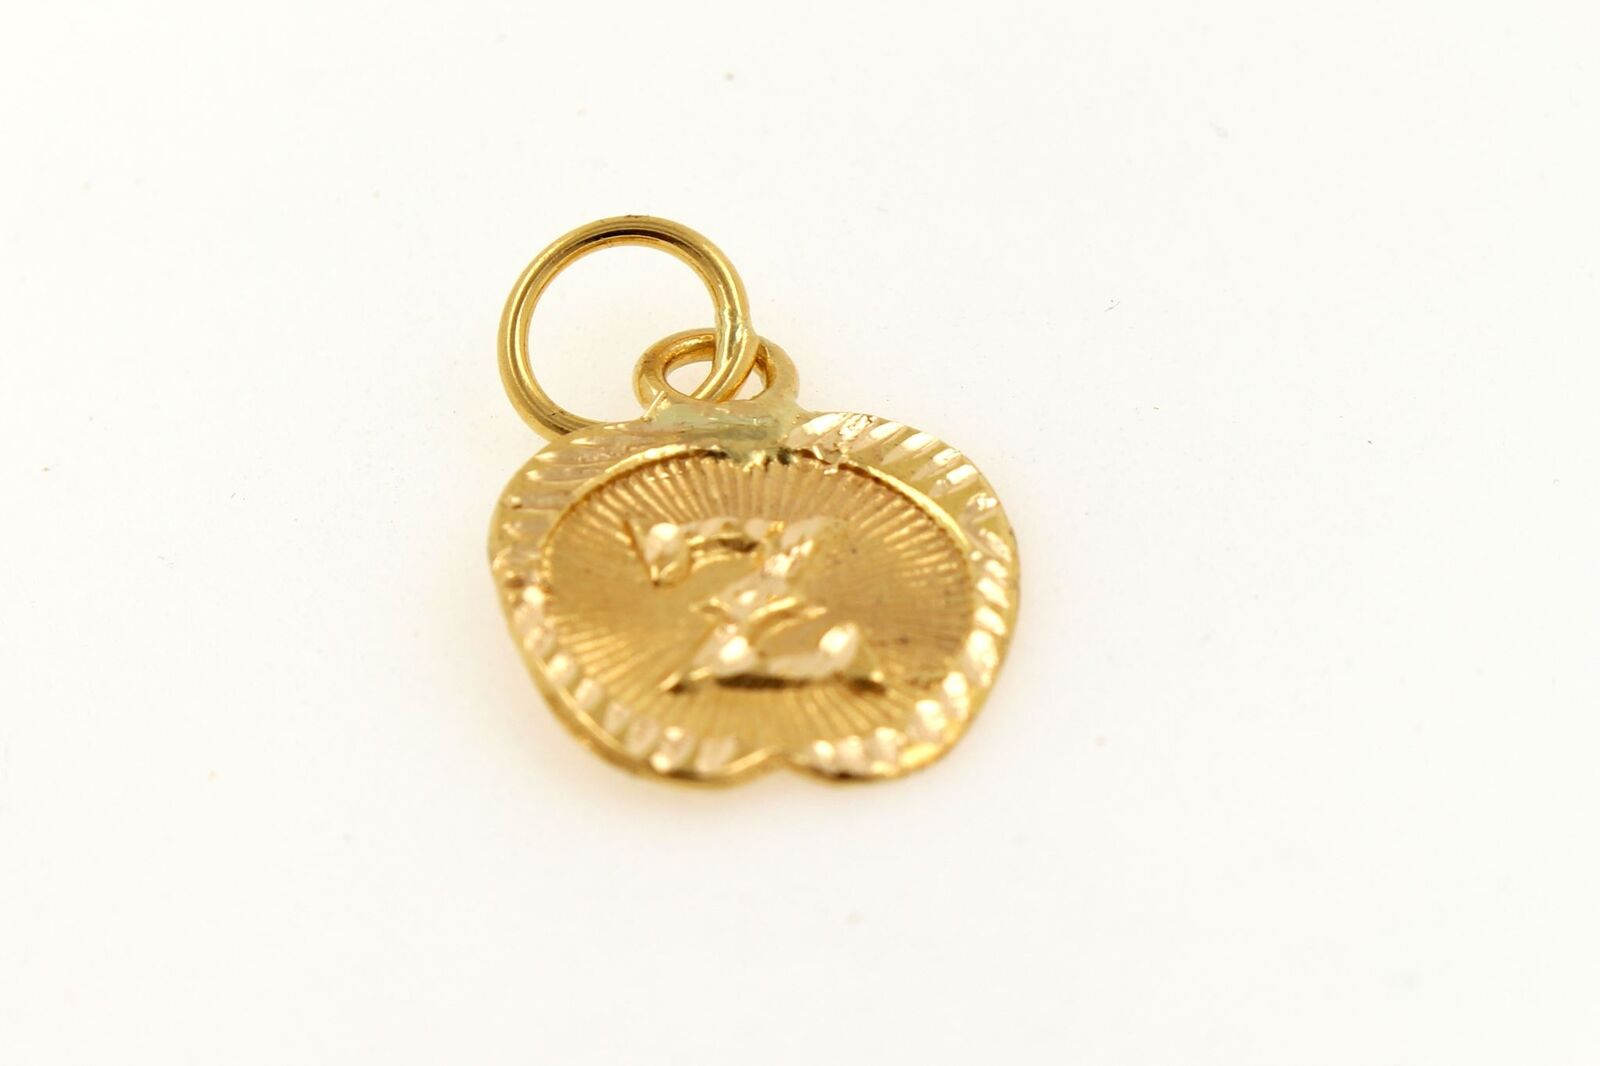 22k 22ct Solid gold Charm Letter Z Pendant Apple Design p1220 ns